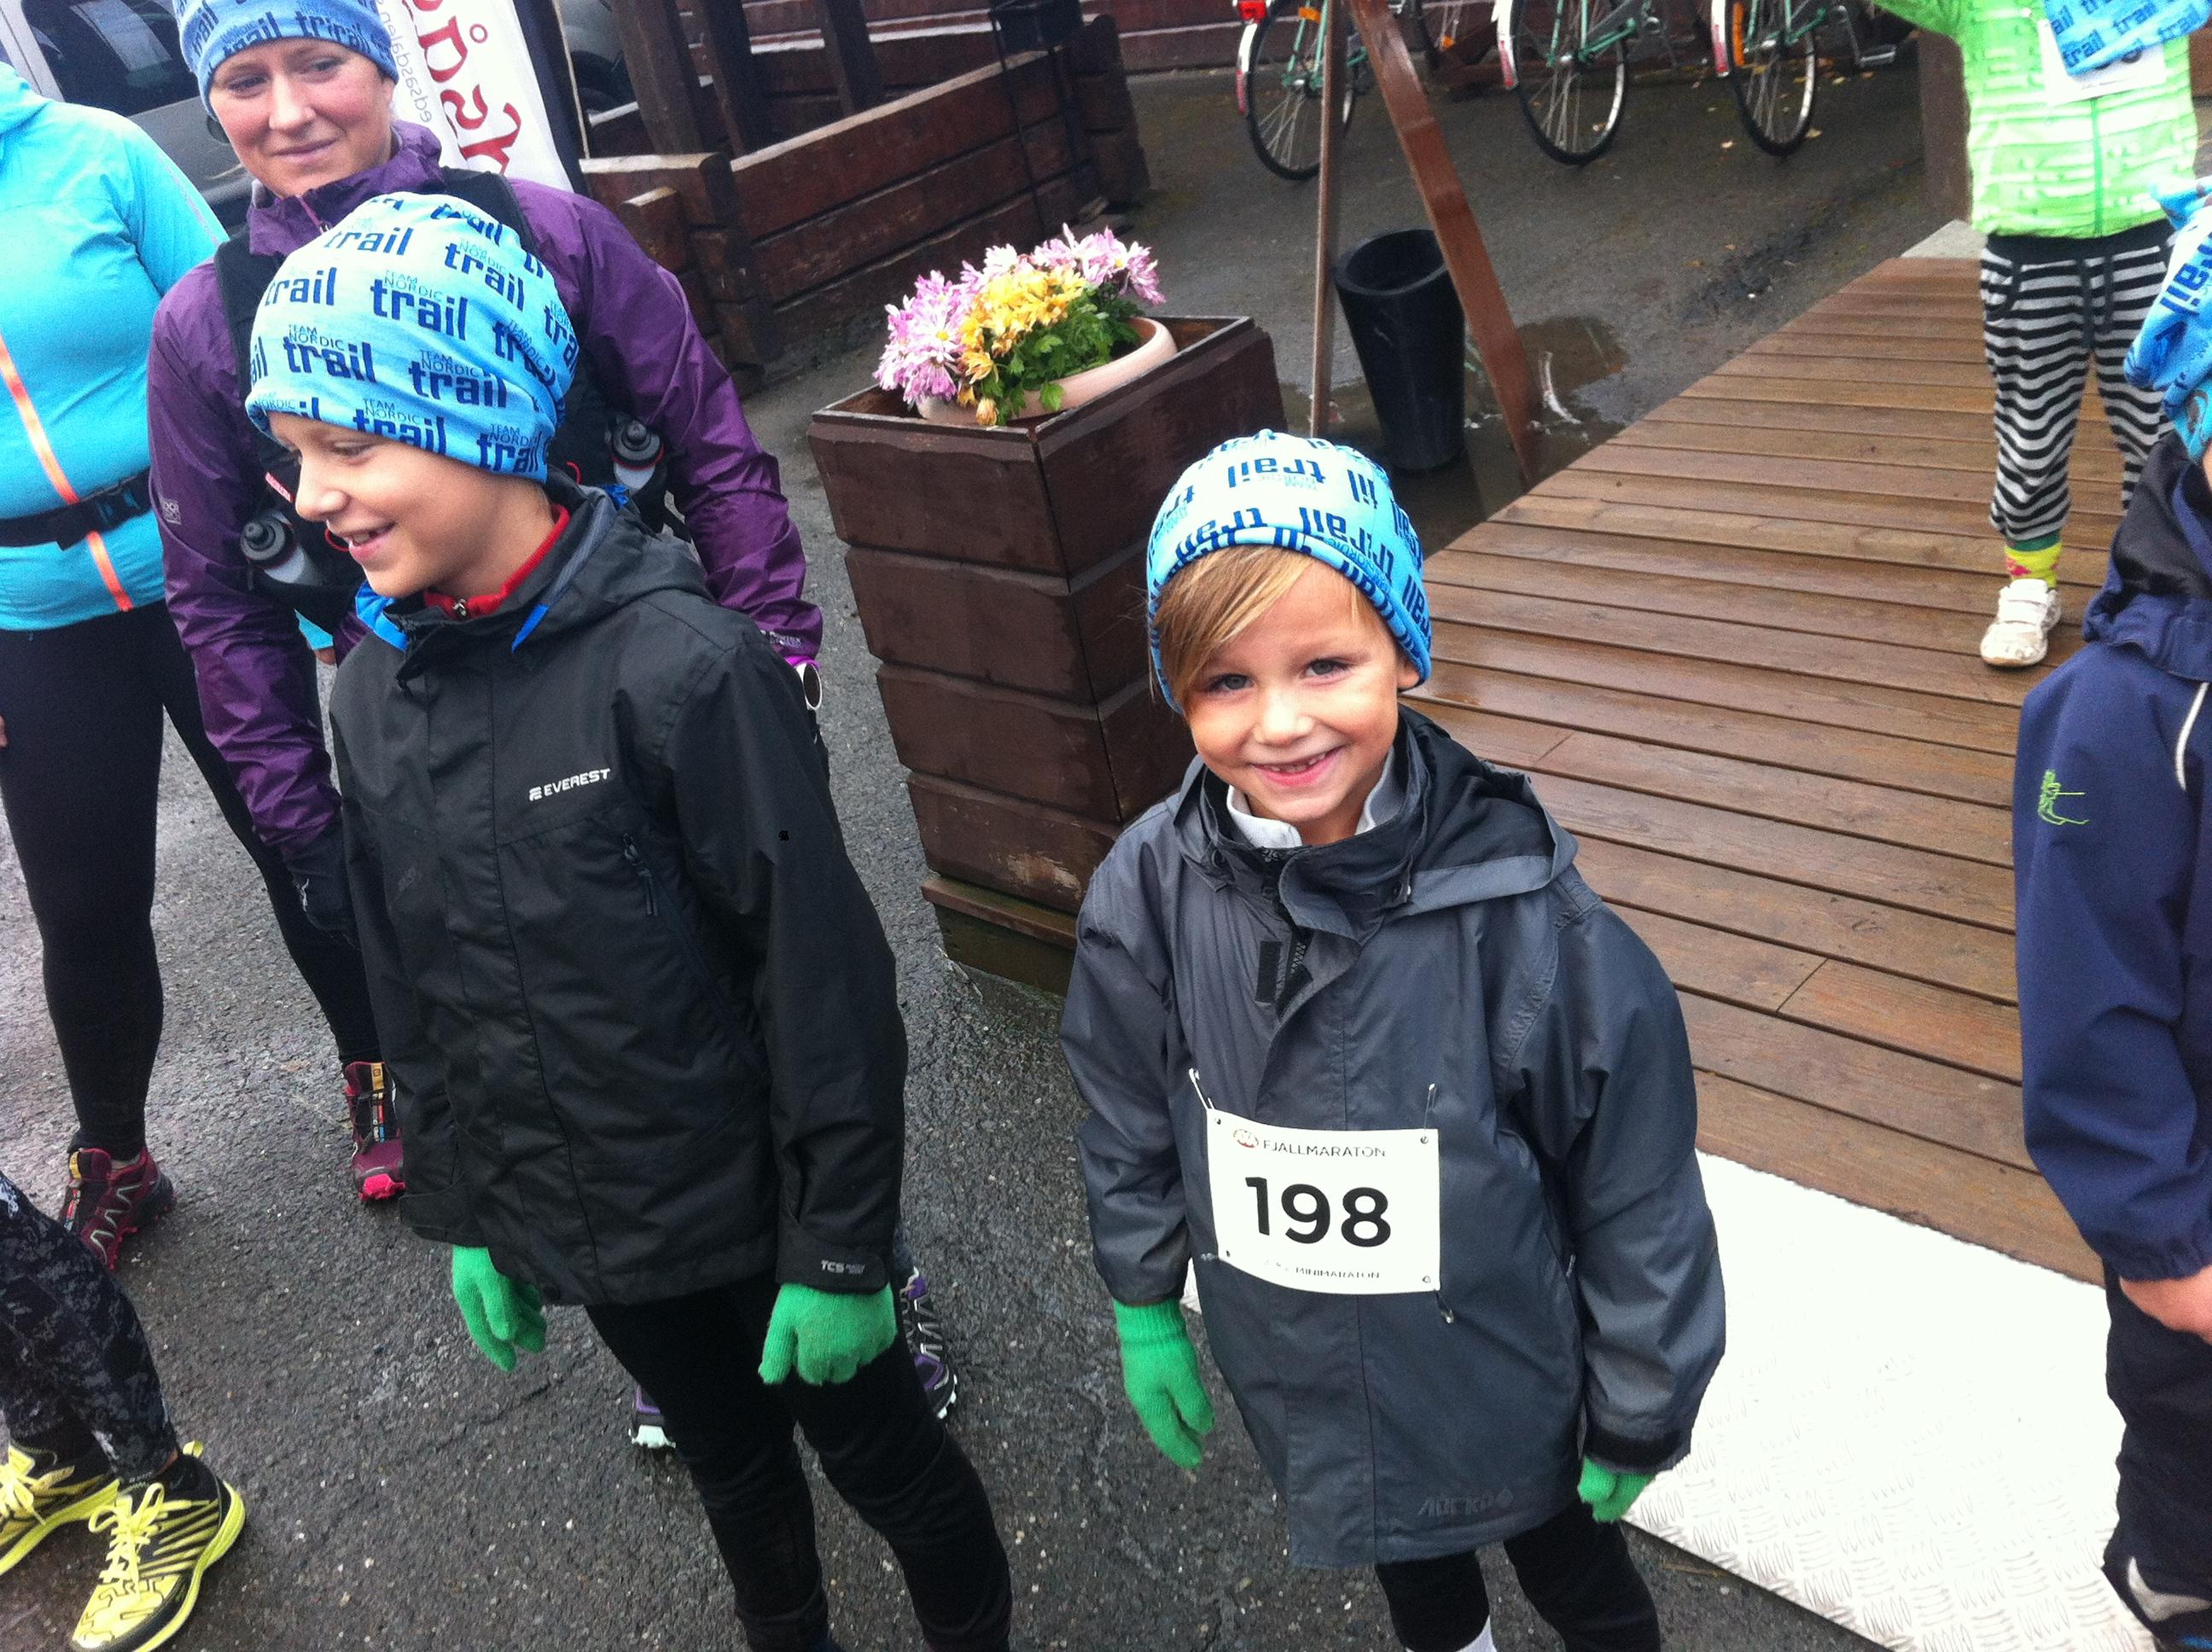 Team Nordic Trail Edsåsdalen TrailKids!